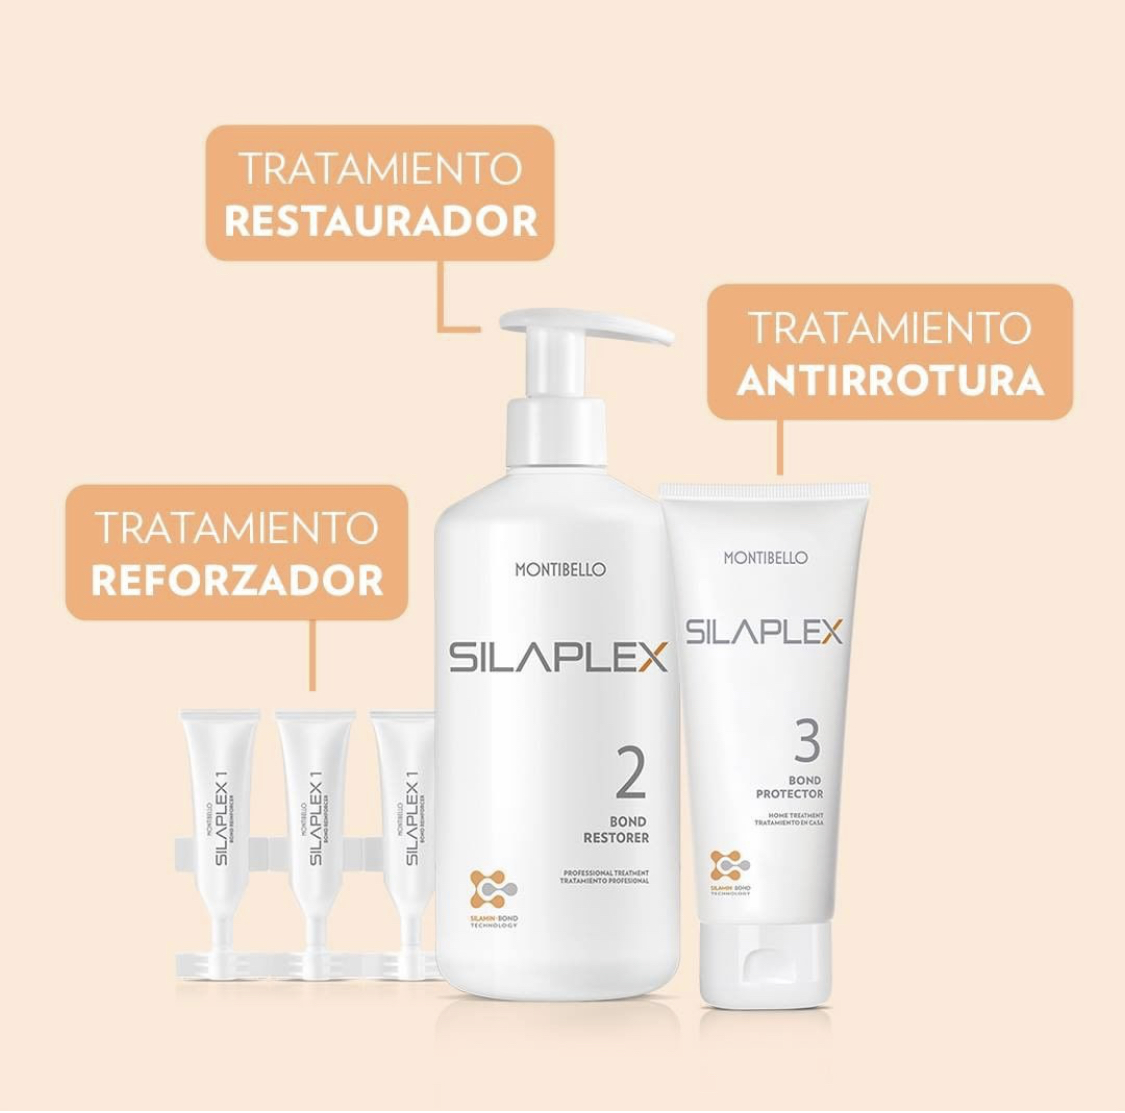 tractament-silaplex-montibello